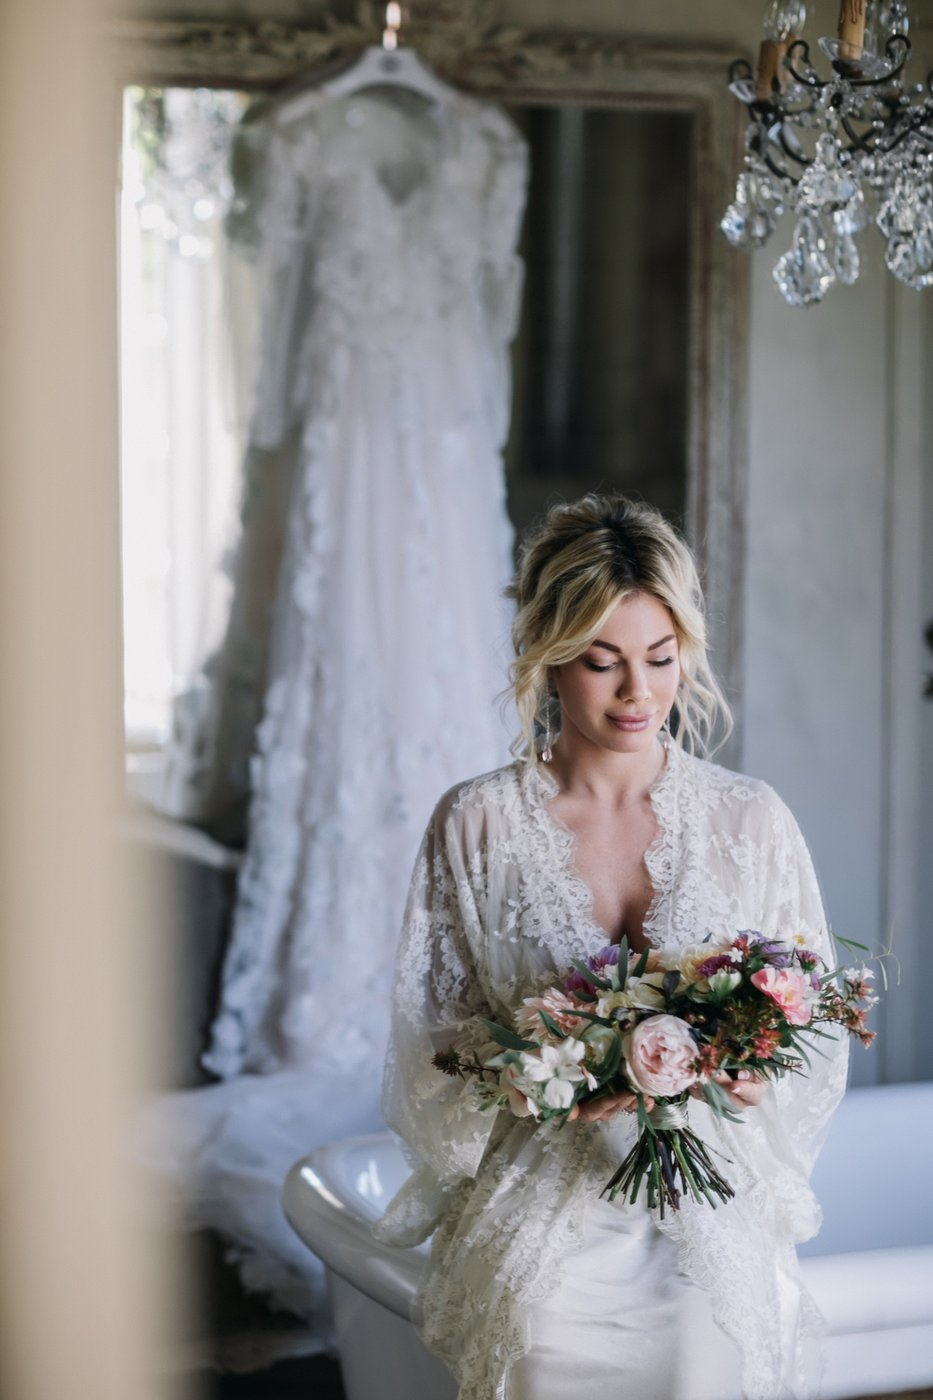 Anastasia Mezhik September 25 2016 Tuscany Italy-All-0055.jpg